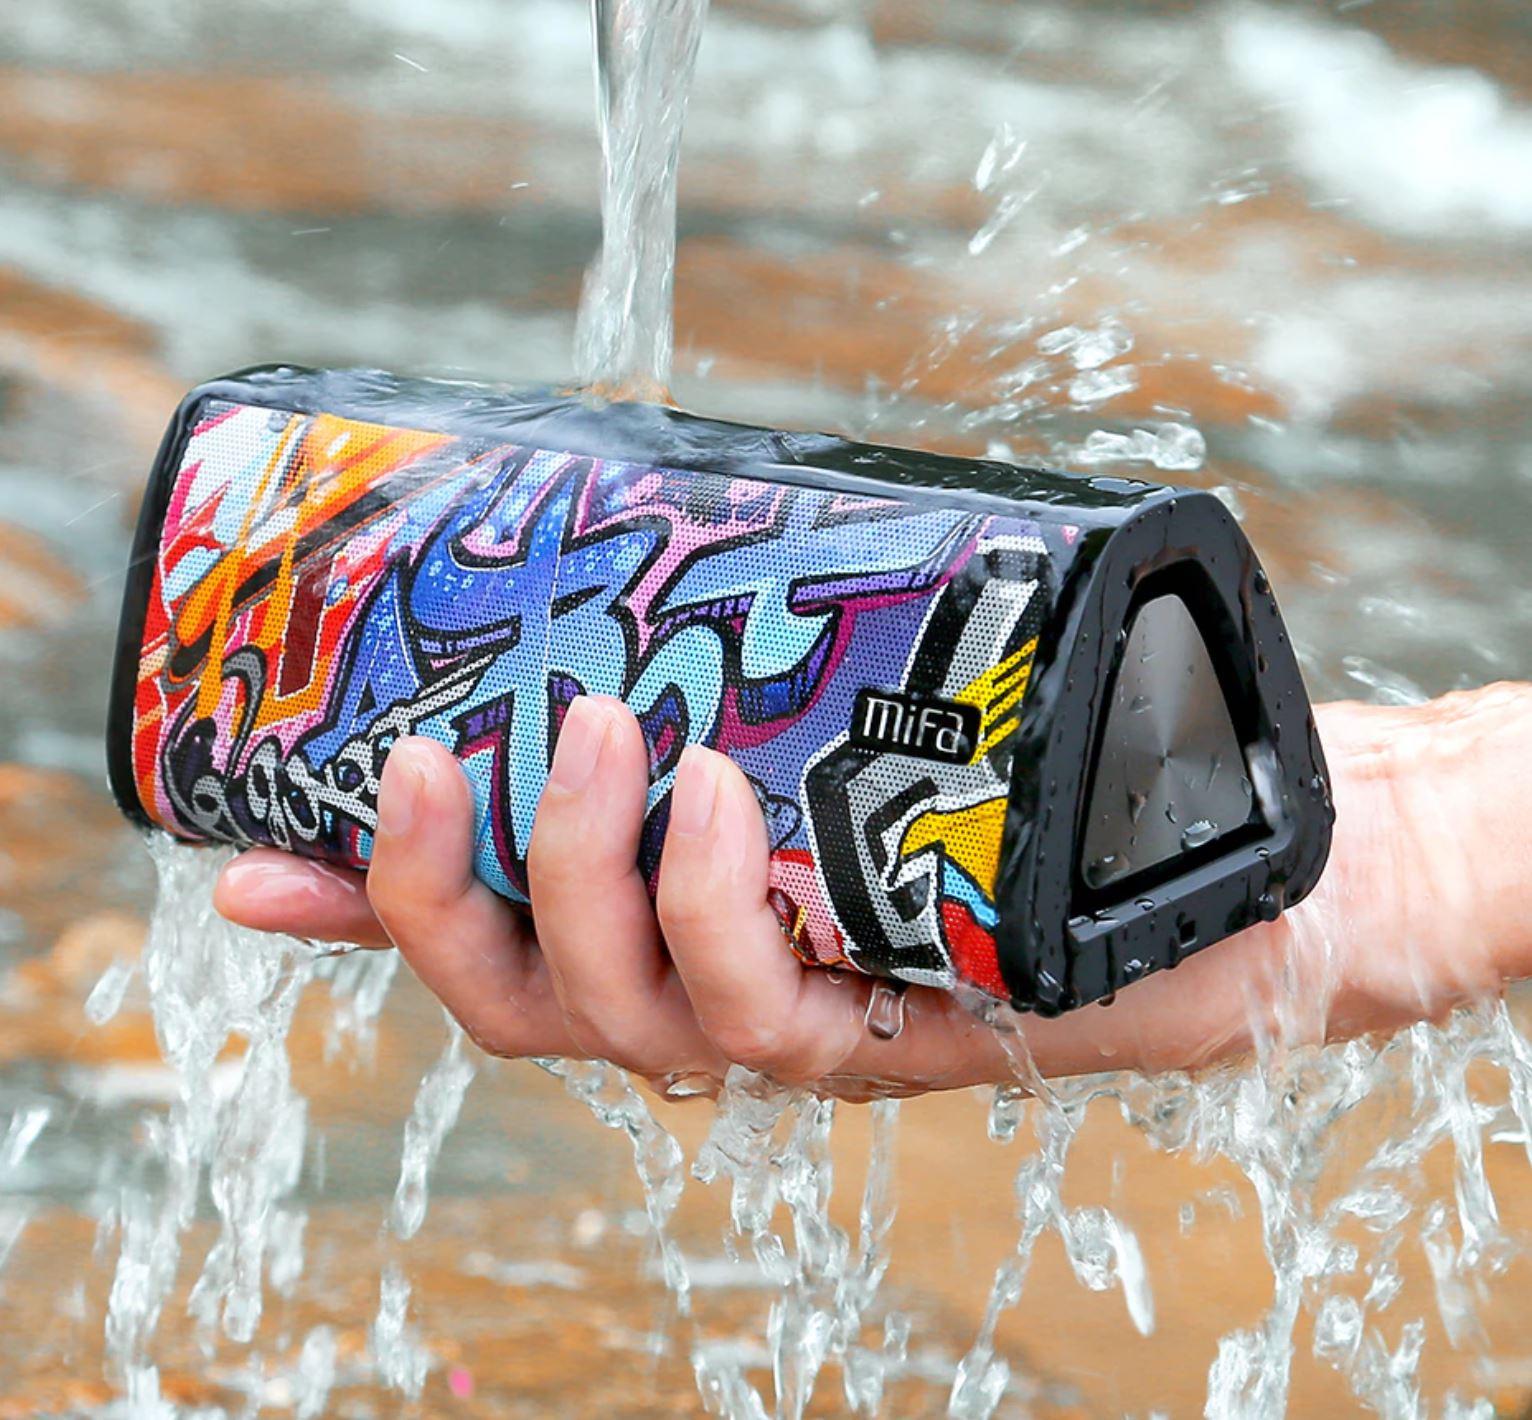 głośnik Mifa A10+ - wodoodporność i graffiti